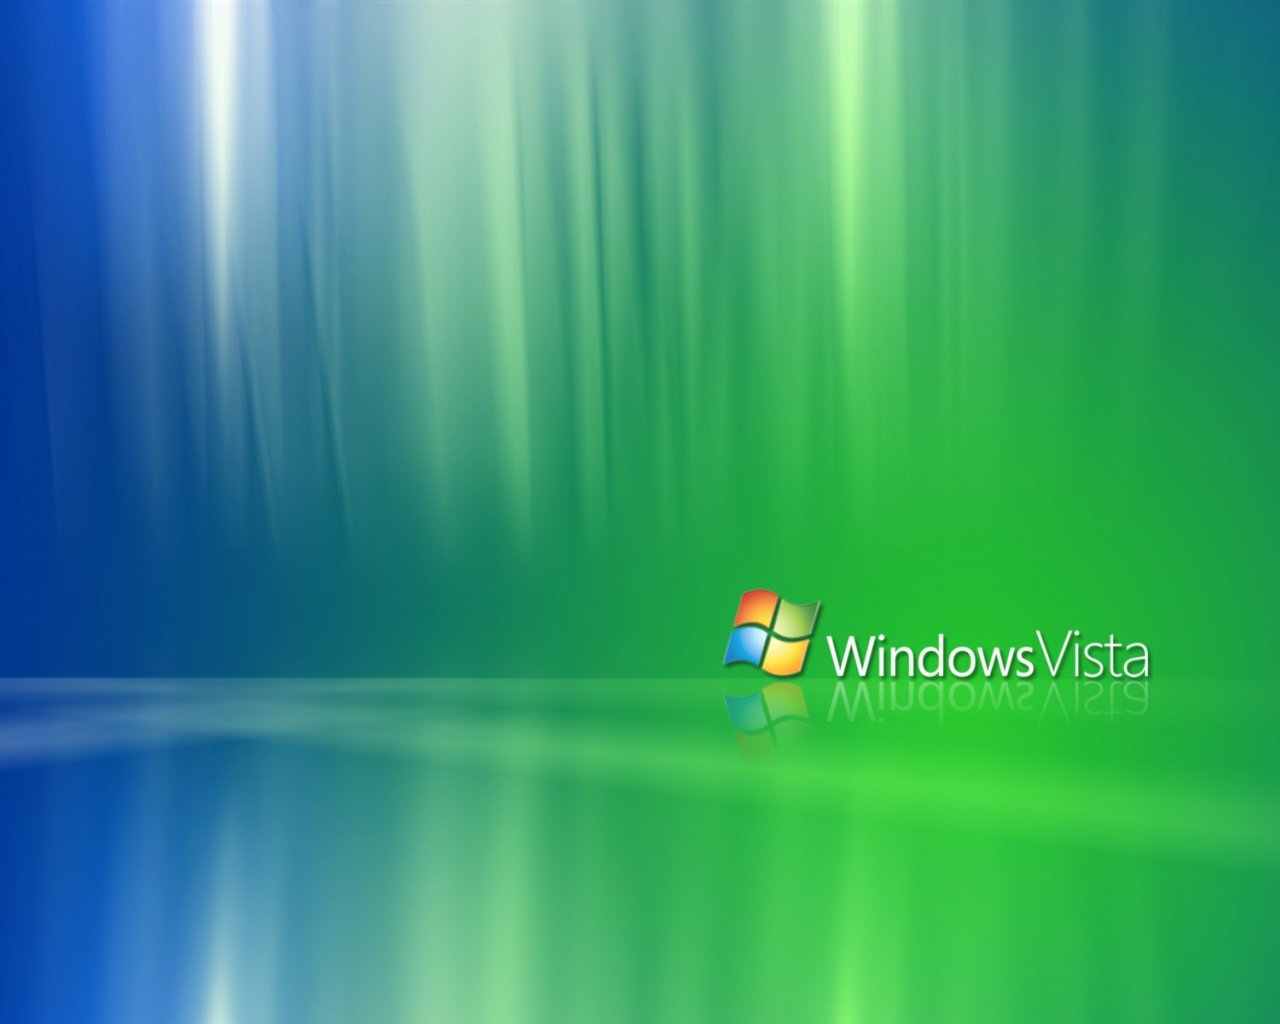 1280x1024 Windows Vista desktop PC and Mac wallpaper 1280x1024